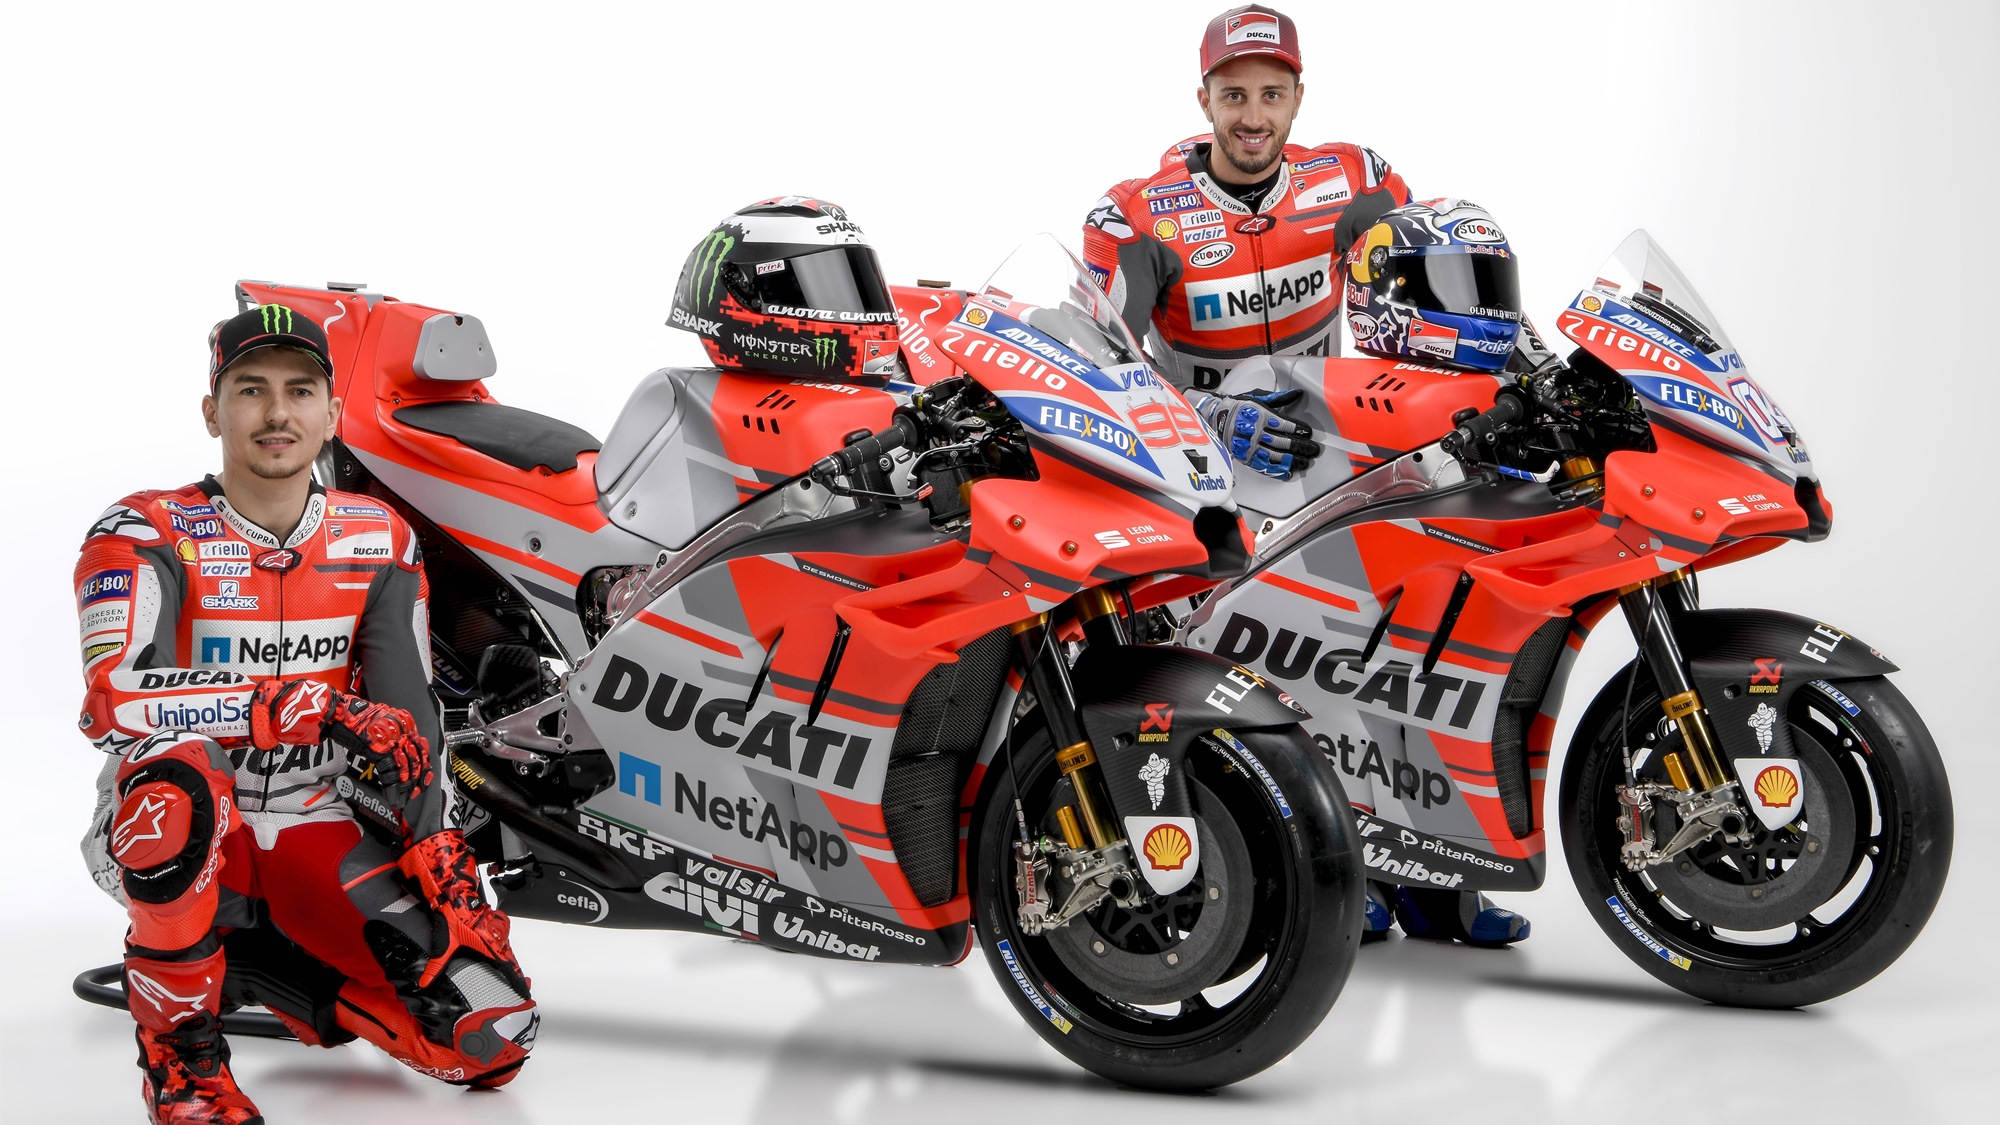 Riello UPS to sponsor Ducati MotoGP team